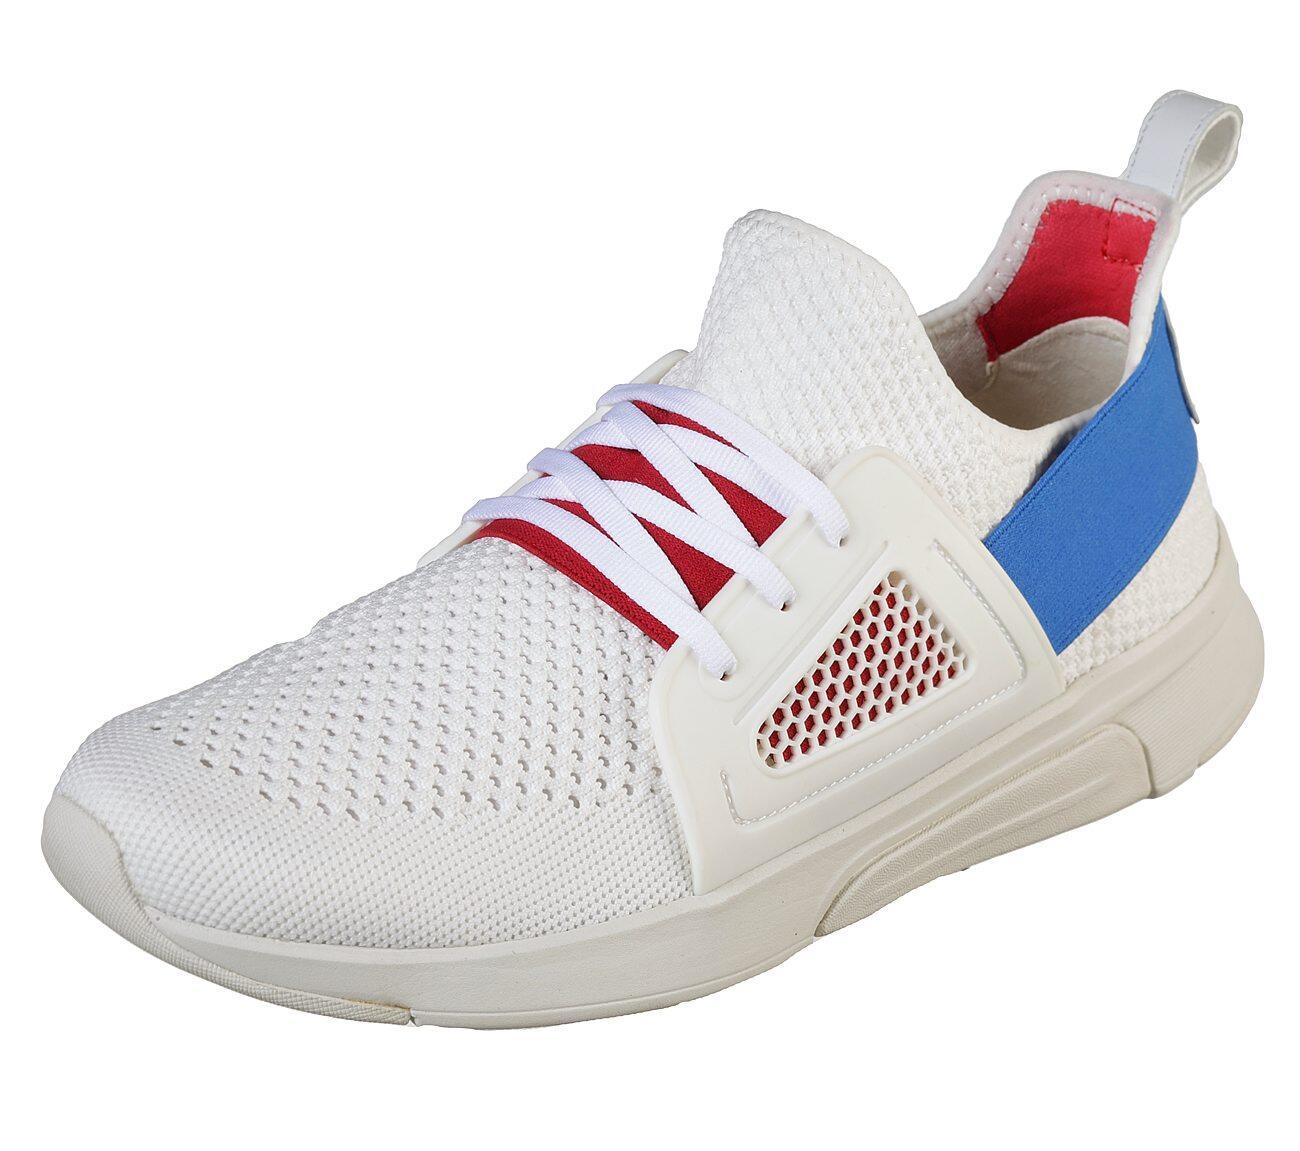 Skechers Modern Jogger Men Lifestyle Shoe - 68689-WMT